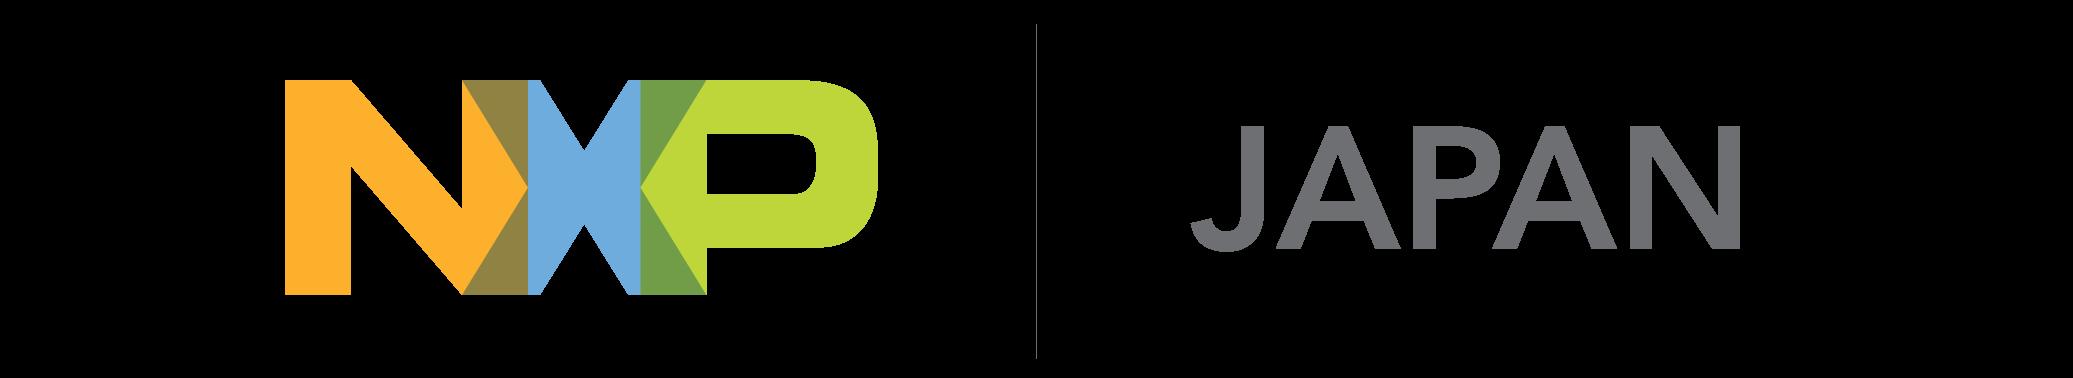 NXP标志